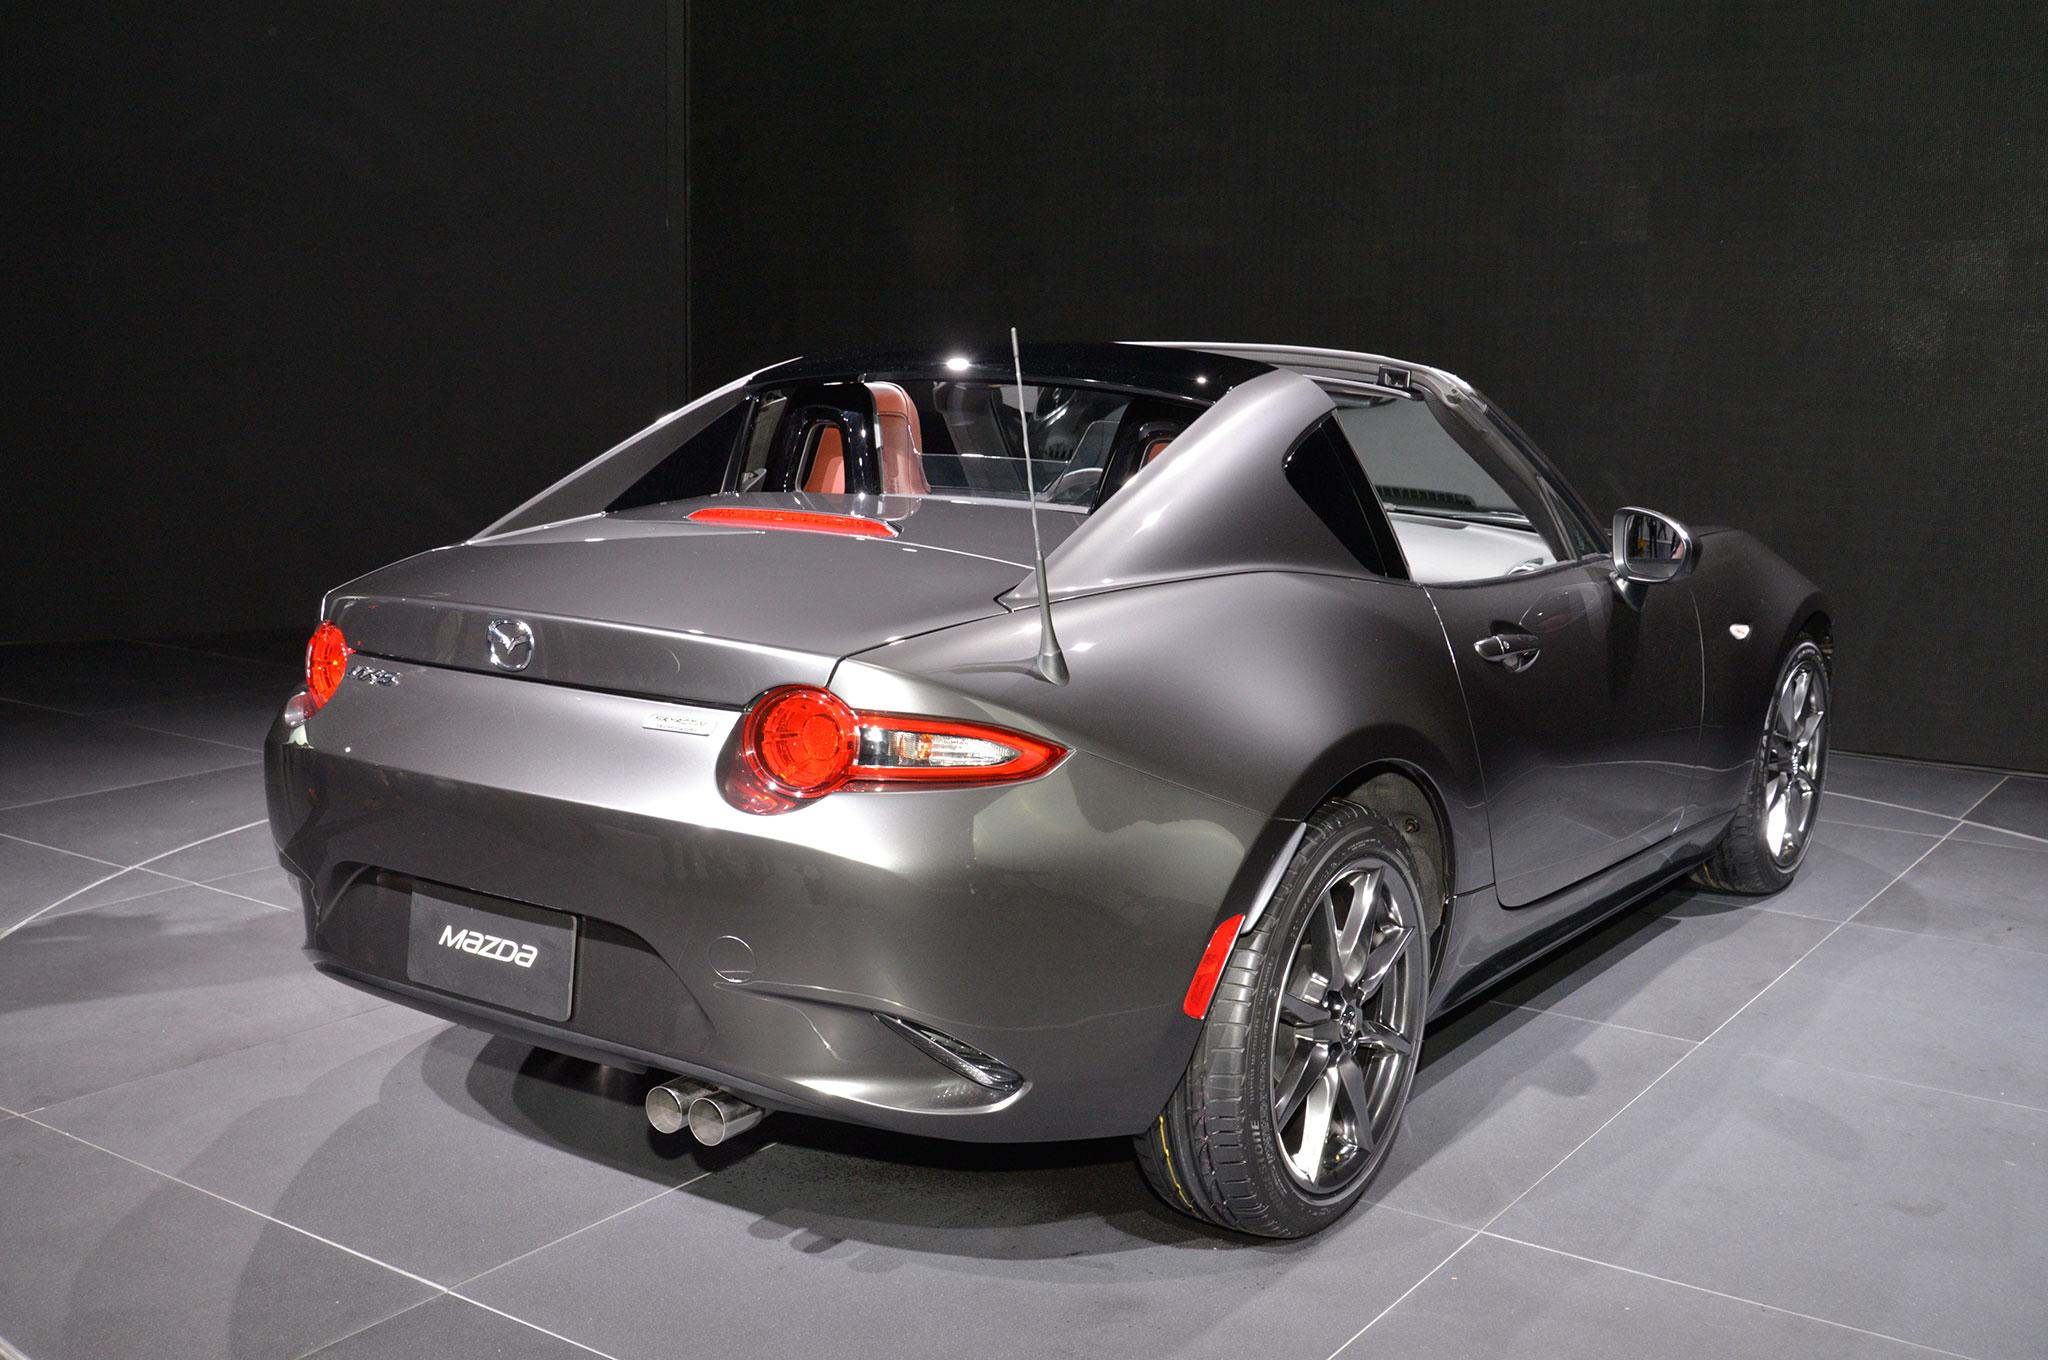 2017 Mazda Mx 5 Miata Rf Exclusive Features Revealed